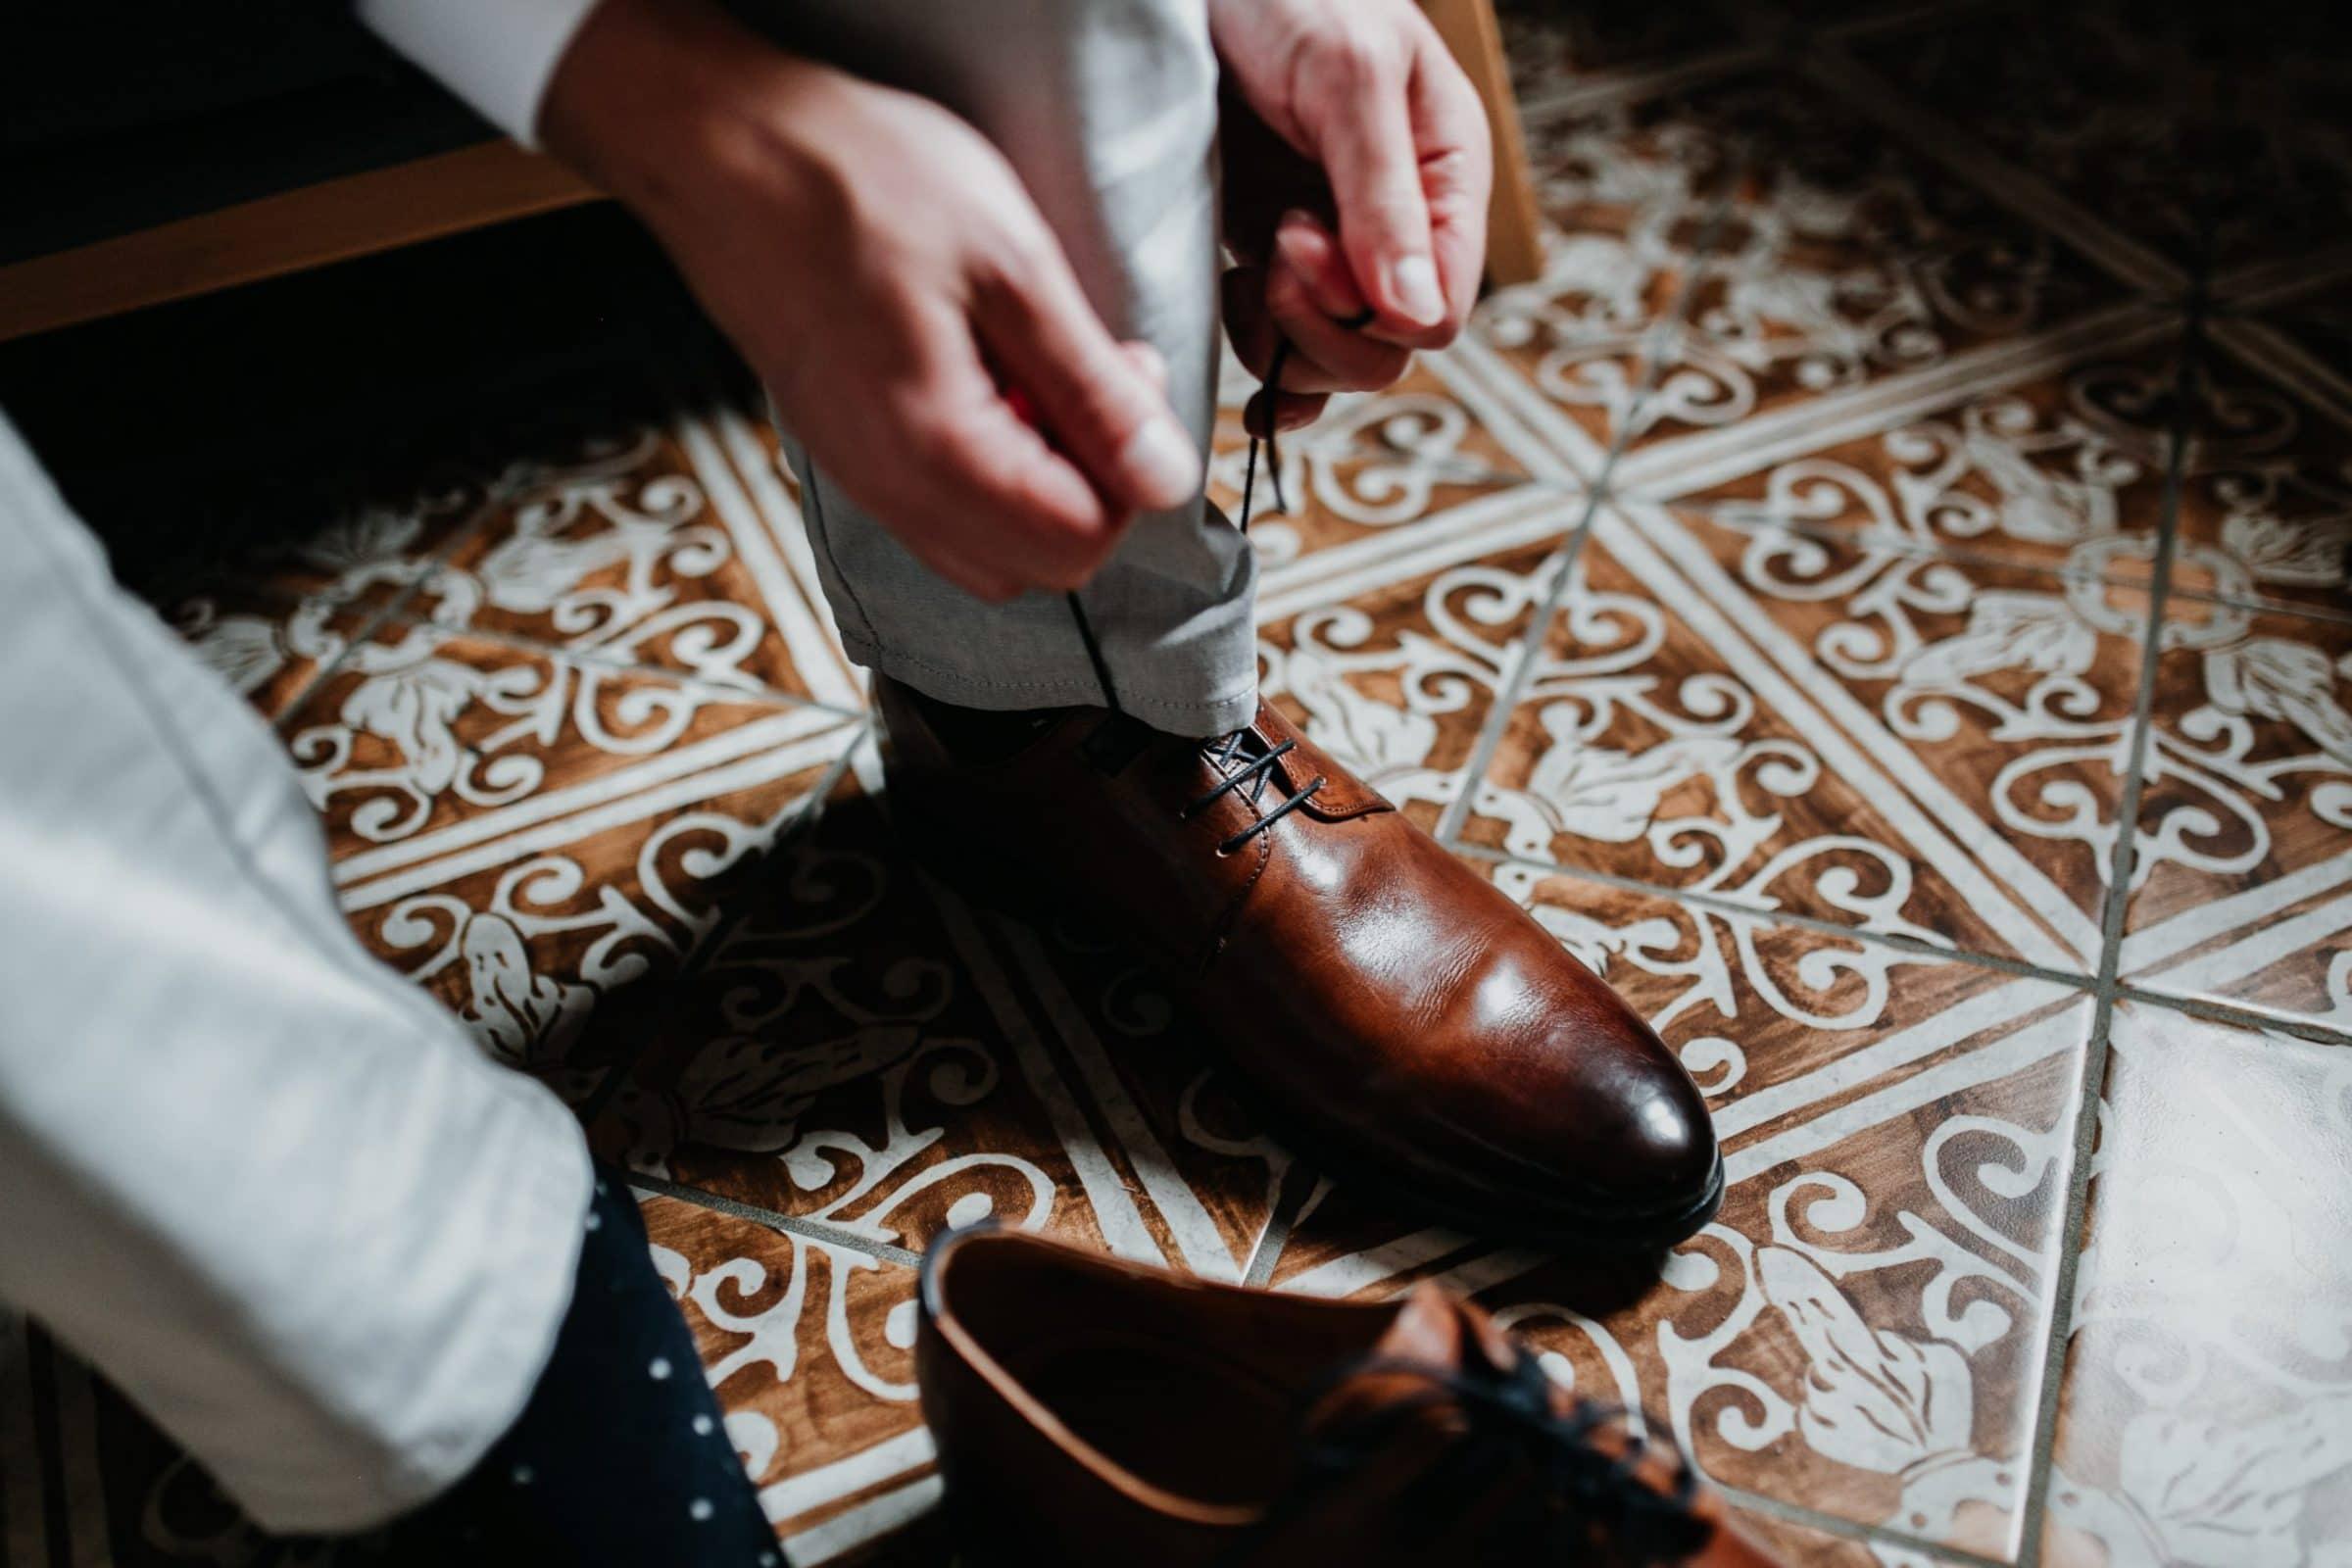 getting ready, groom getting ready, suit, bow tie, fliege, anzug, detailshot, detail, shoe